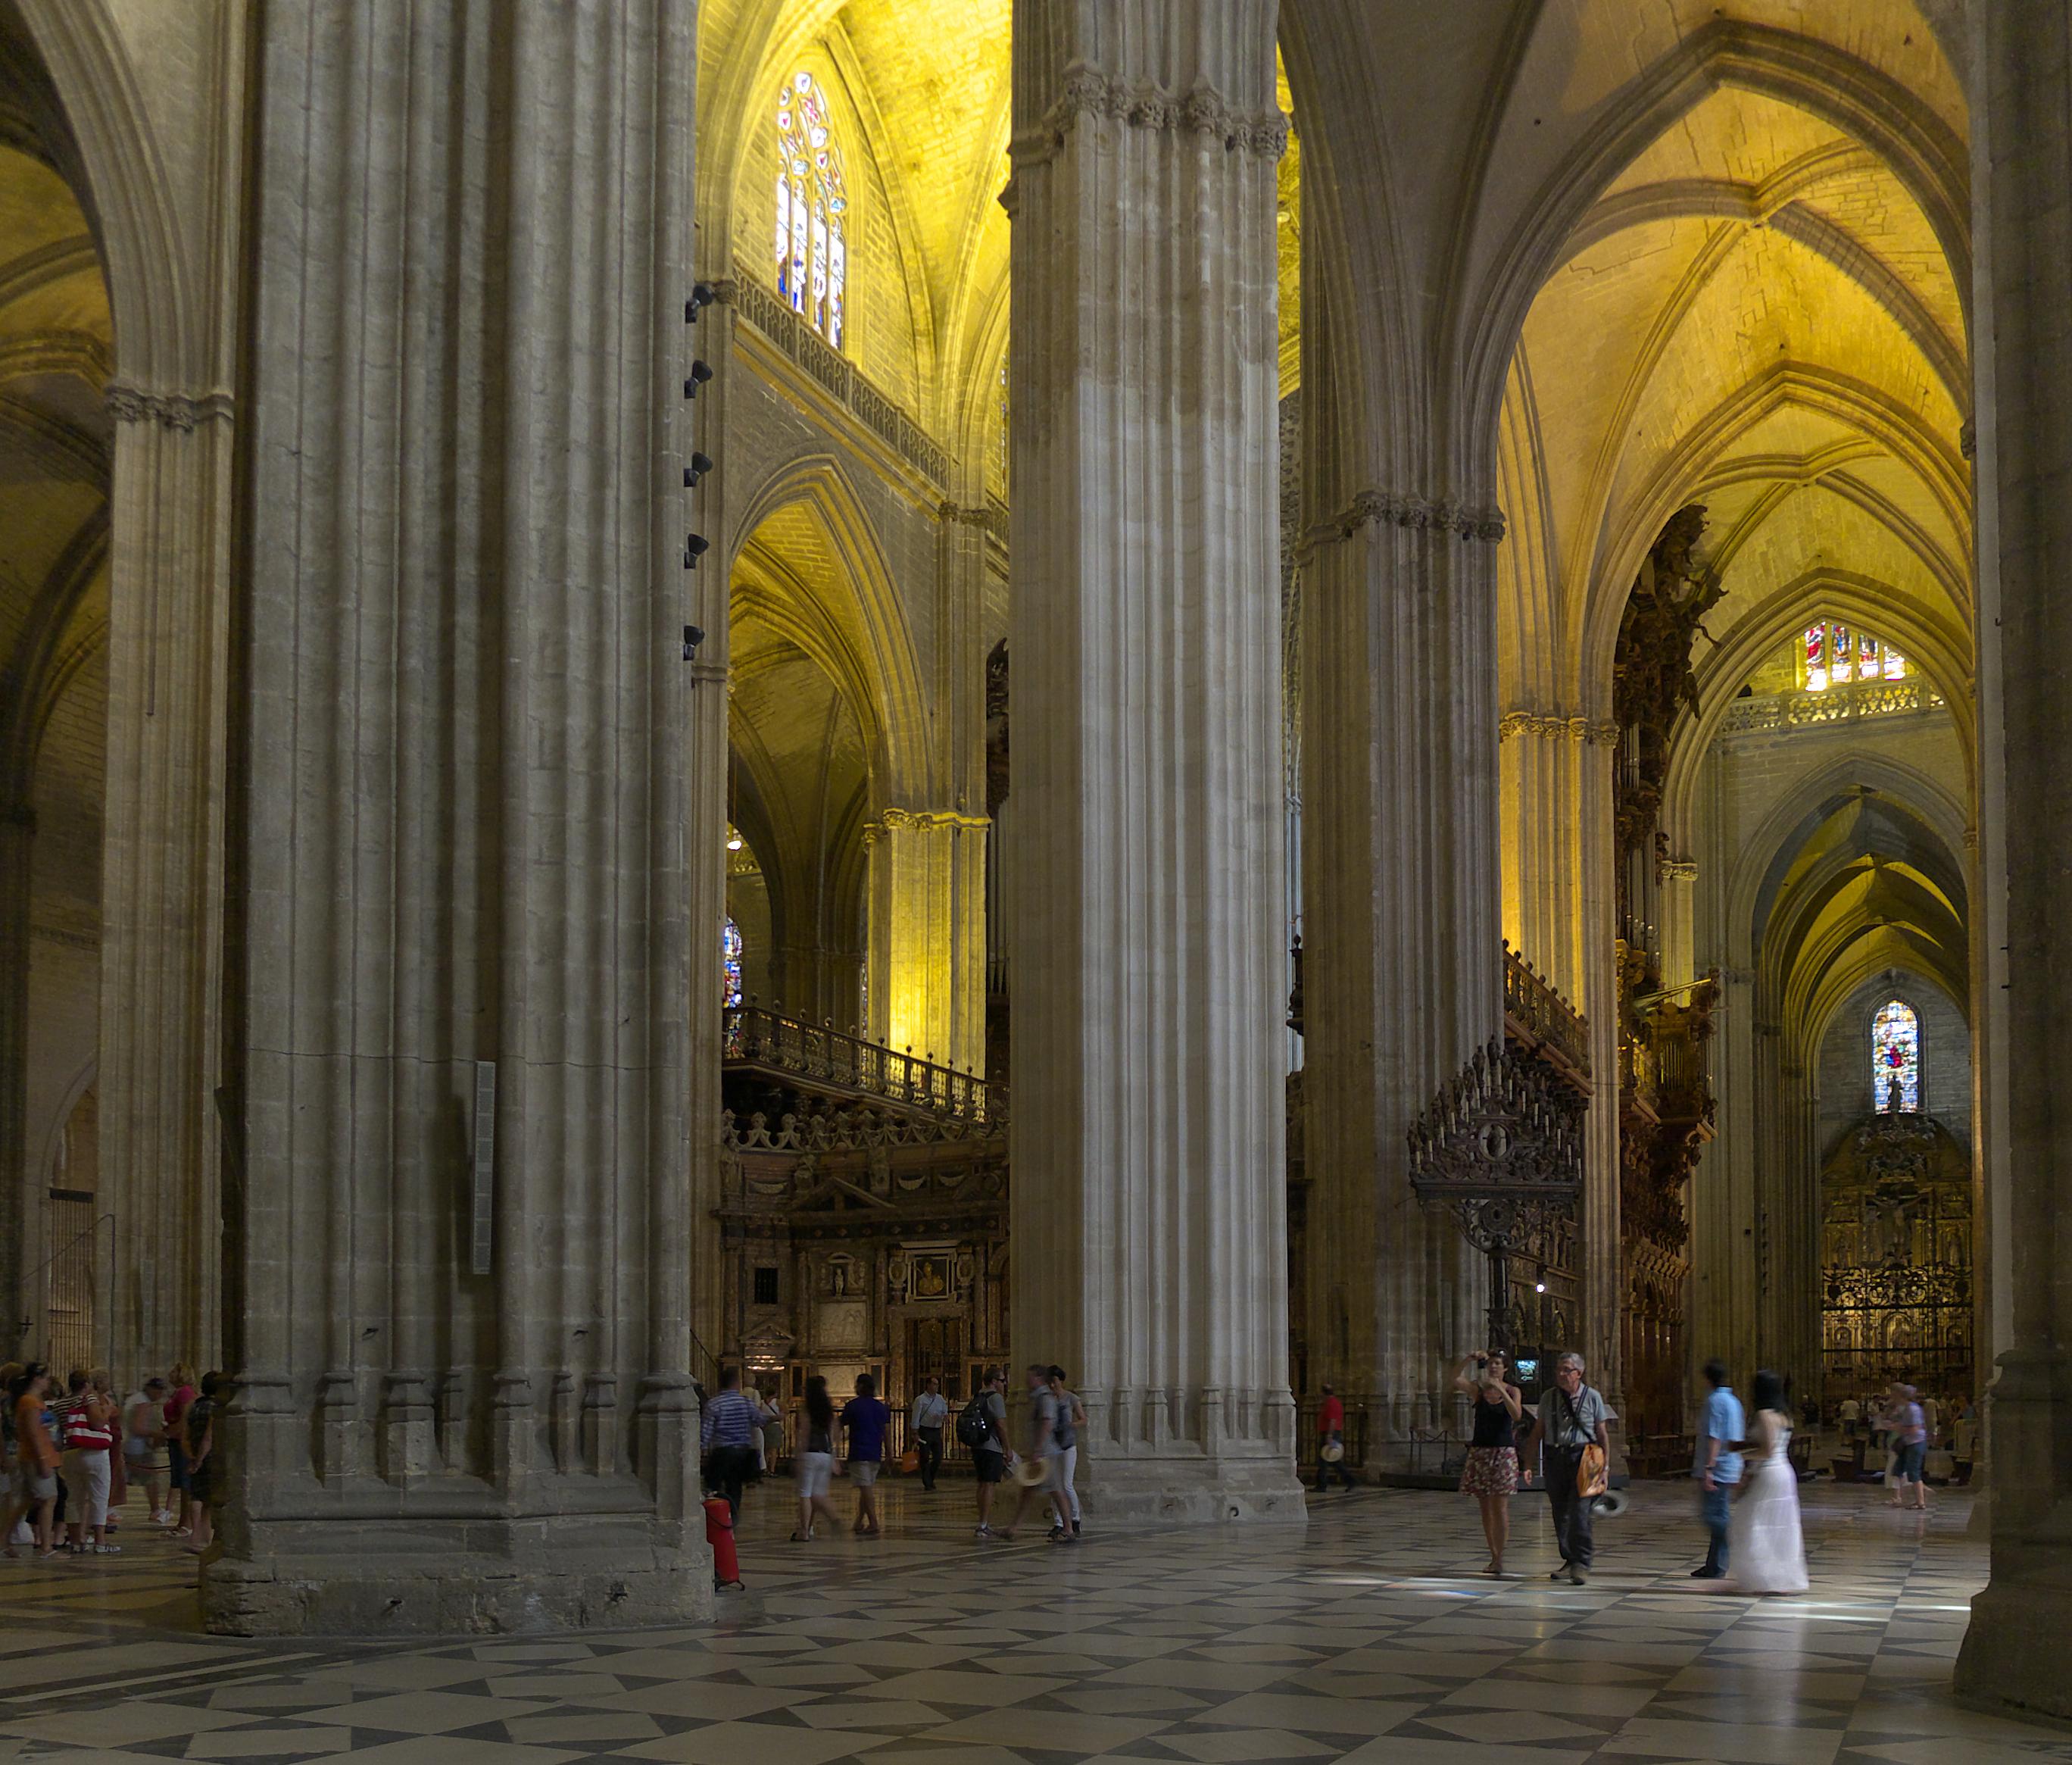 Clothing in spain rick steves travel forum - Catedral de sevilla interior ...